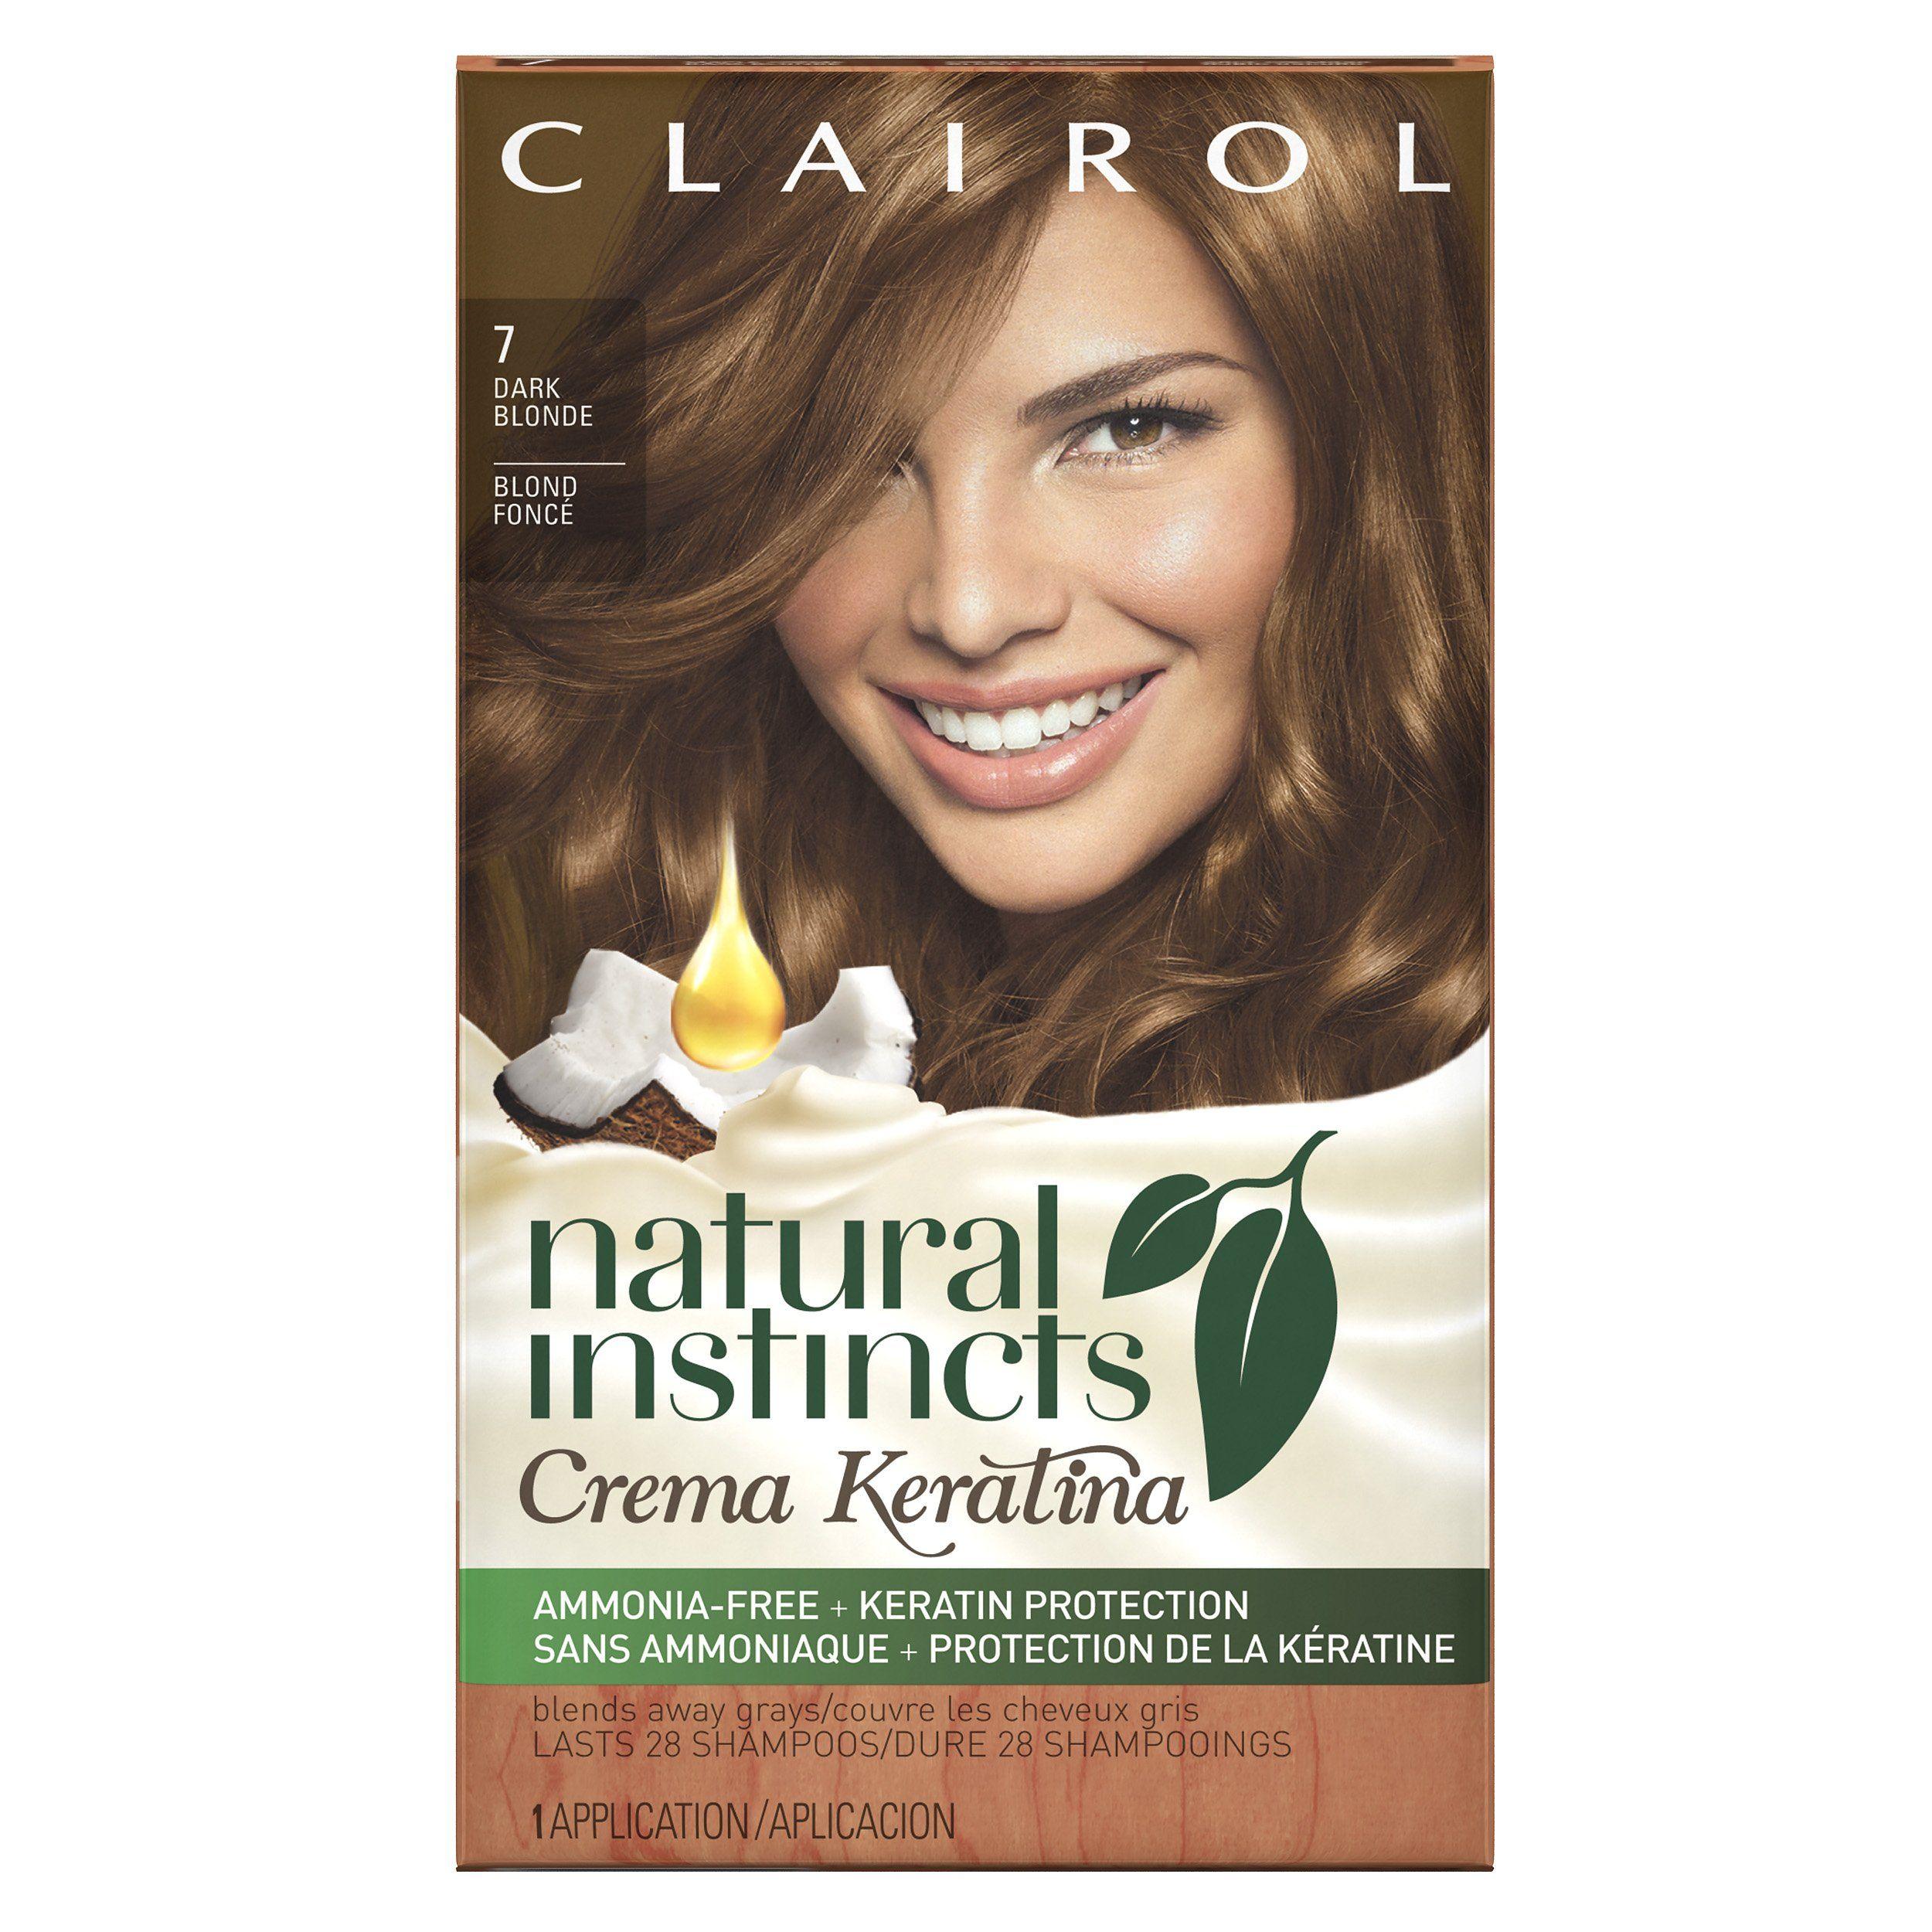 Clairol Natural Instincts Crema Keratina Hair Color Kit Dark Blonde